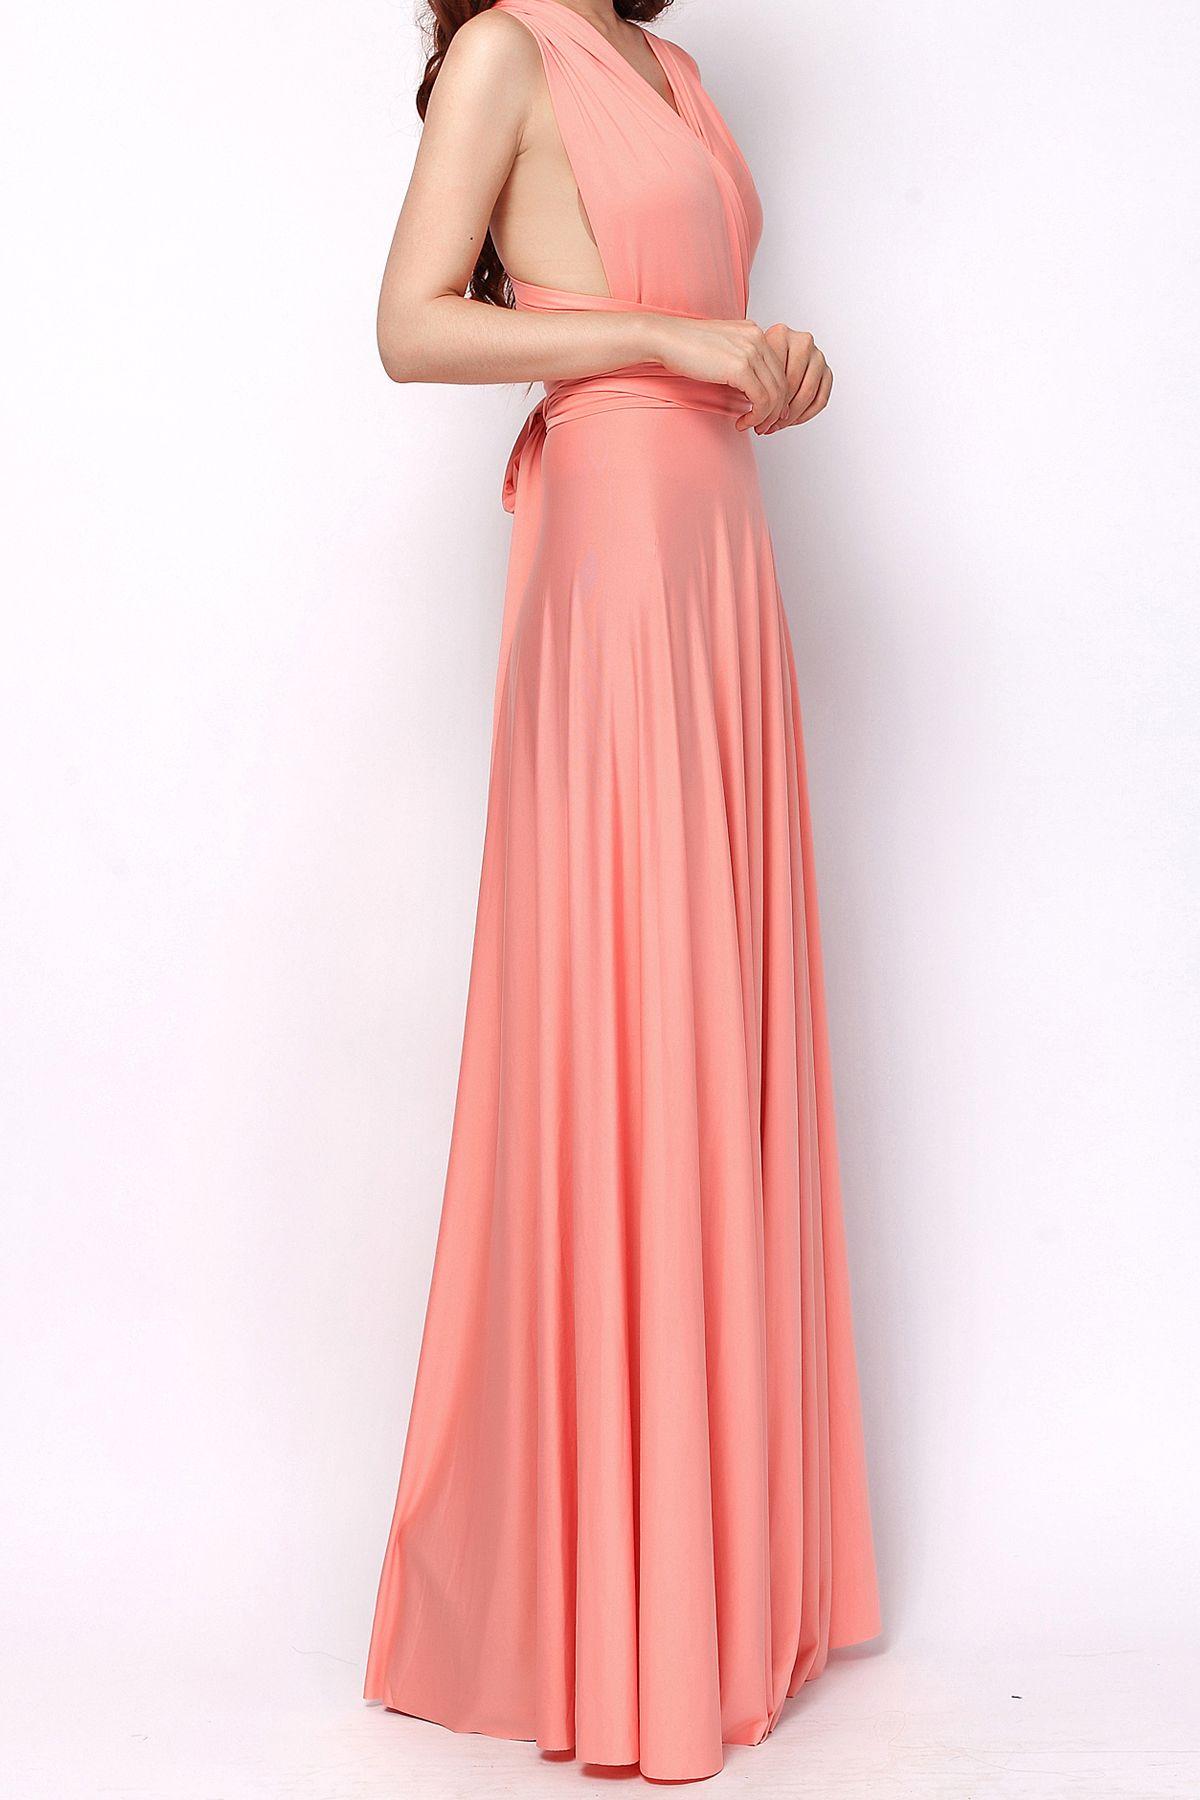 Light coral long infinity dress bridesmaids dresses [lg-35] - $73.80 ...